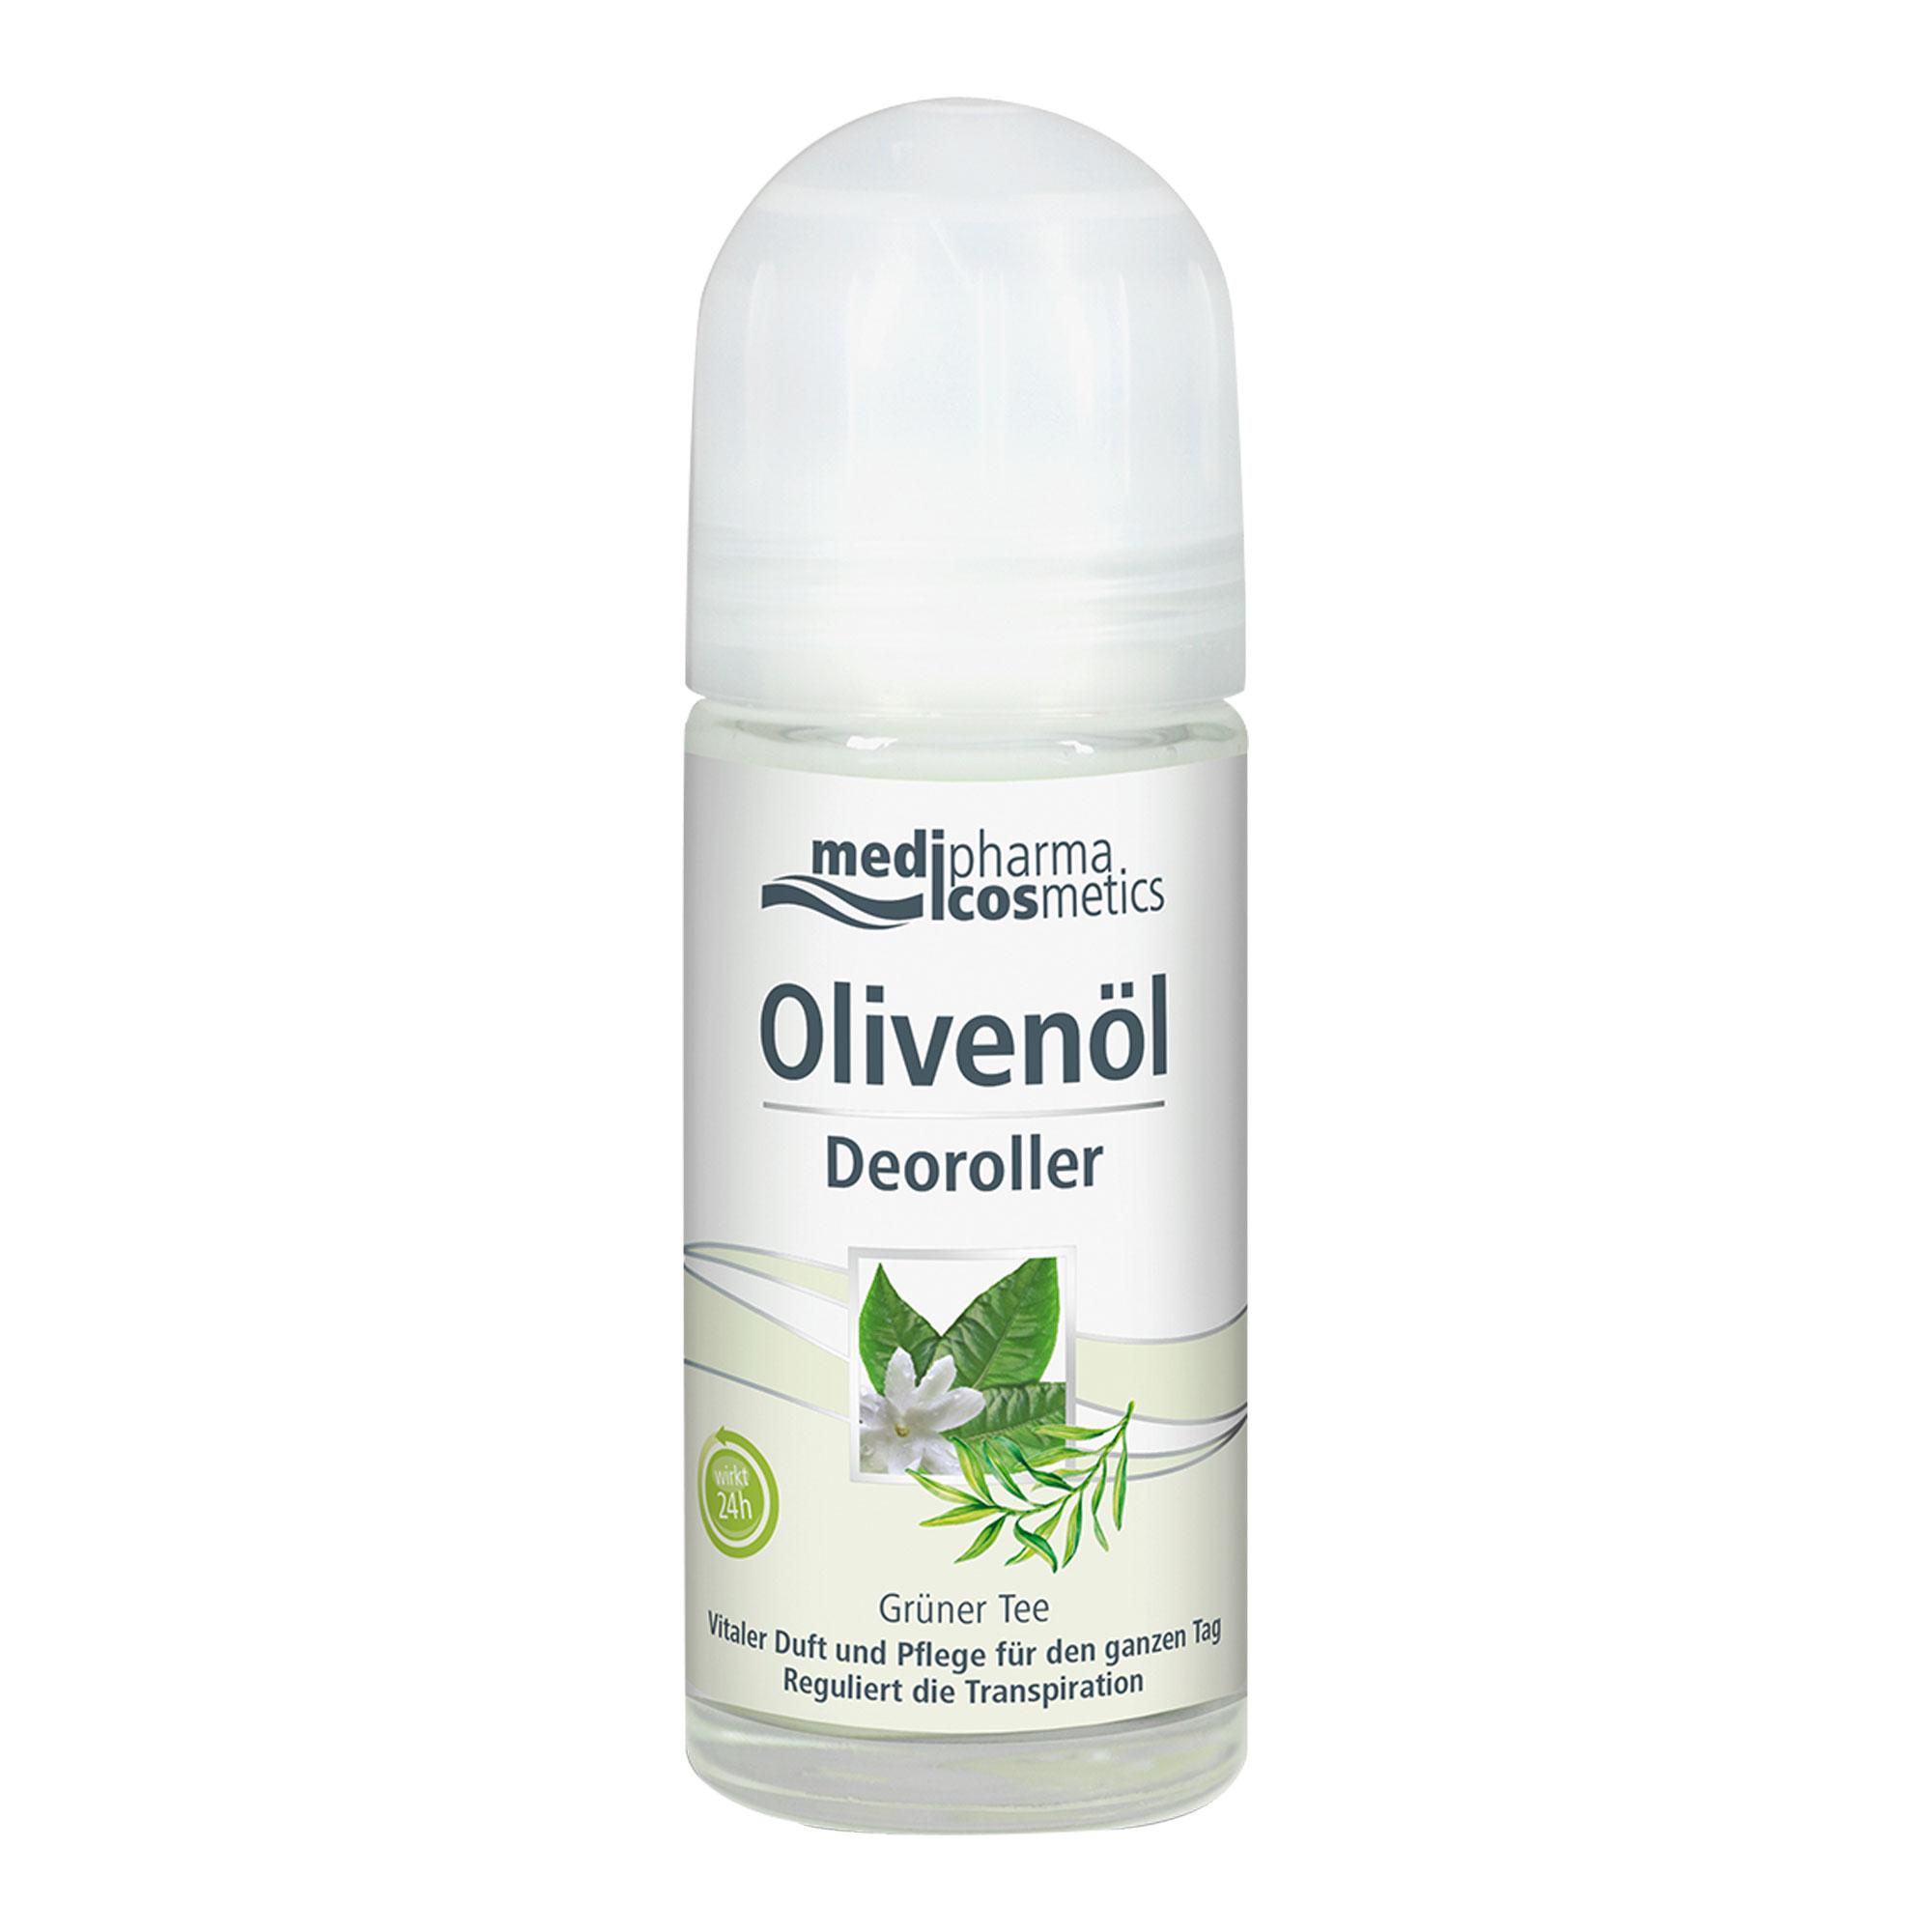 Olivenöl Deoroller Grüner Tee